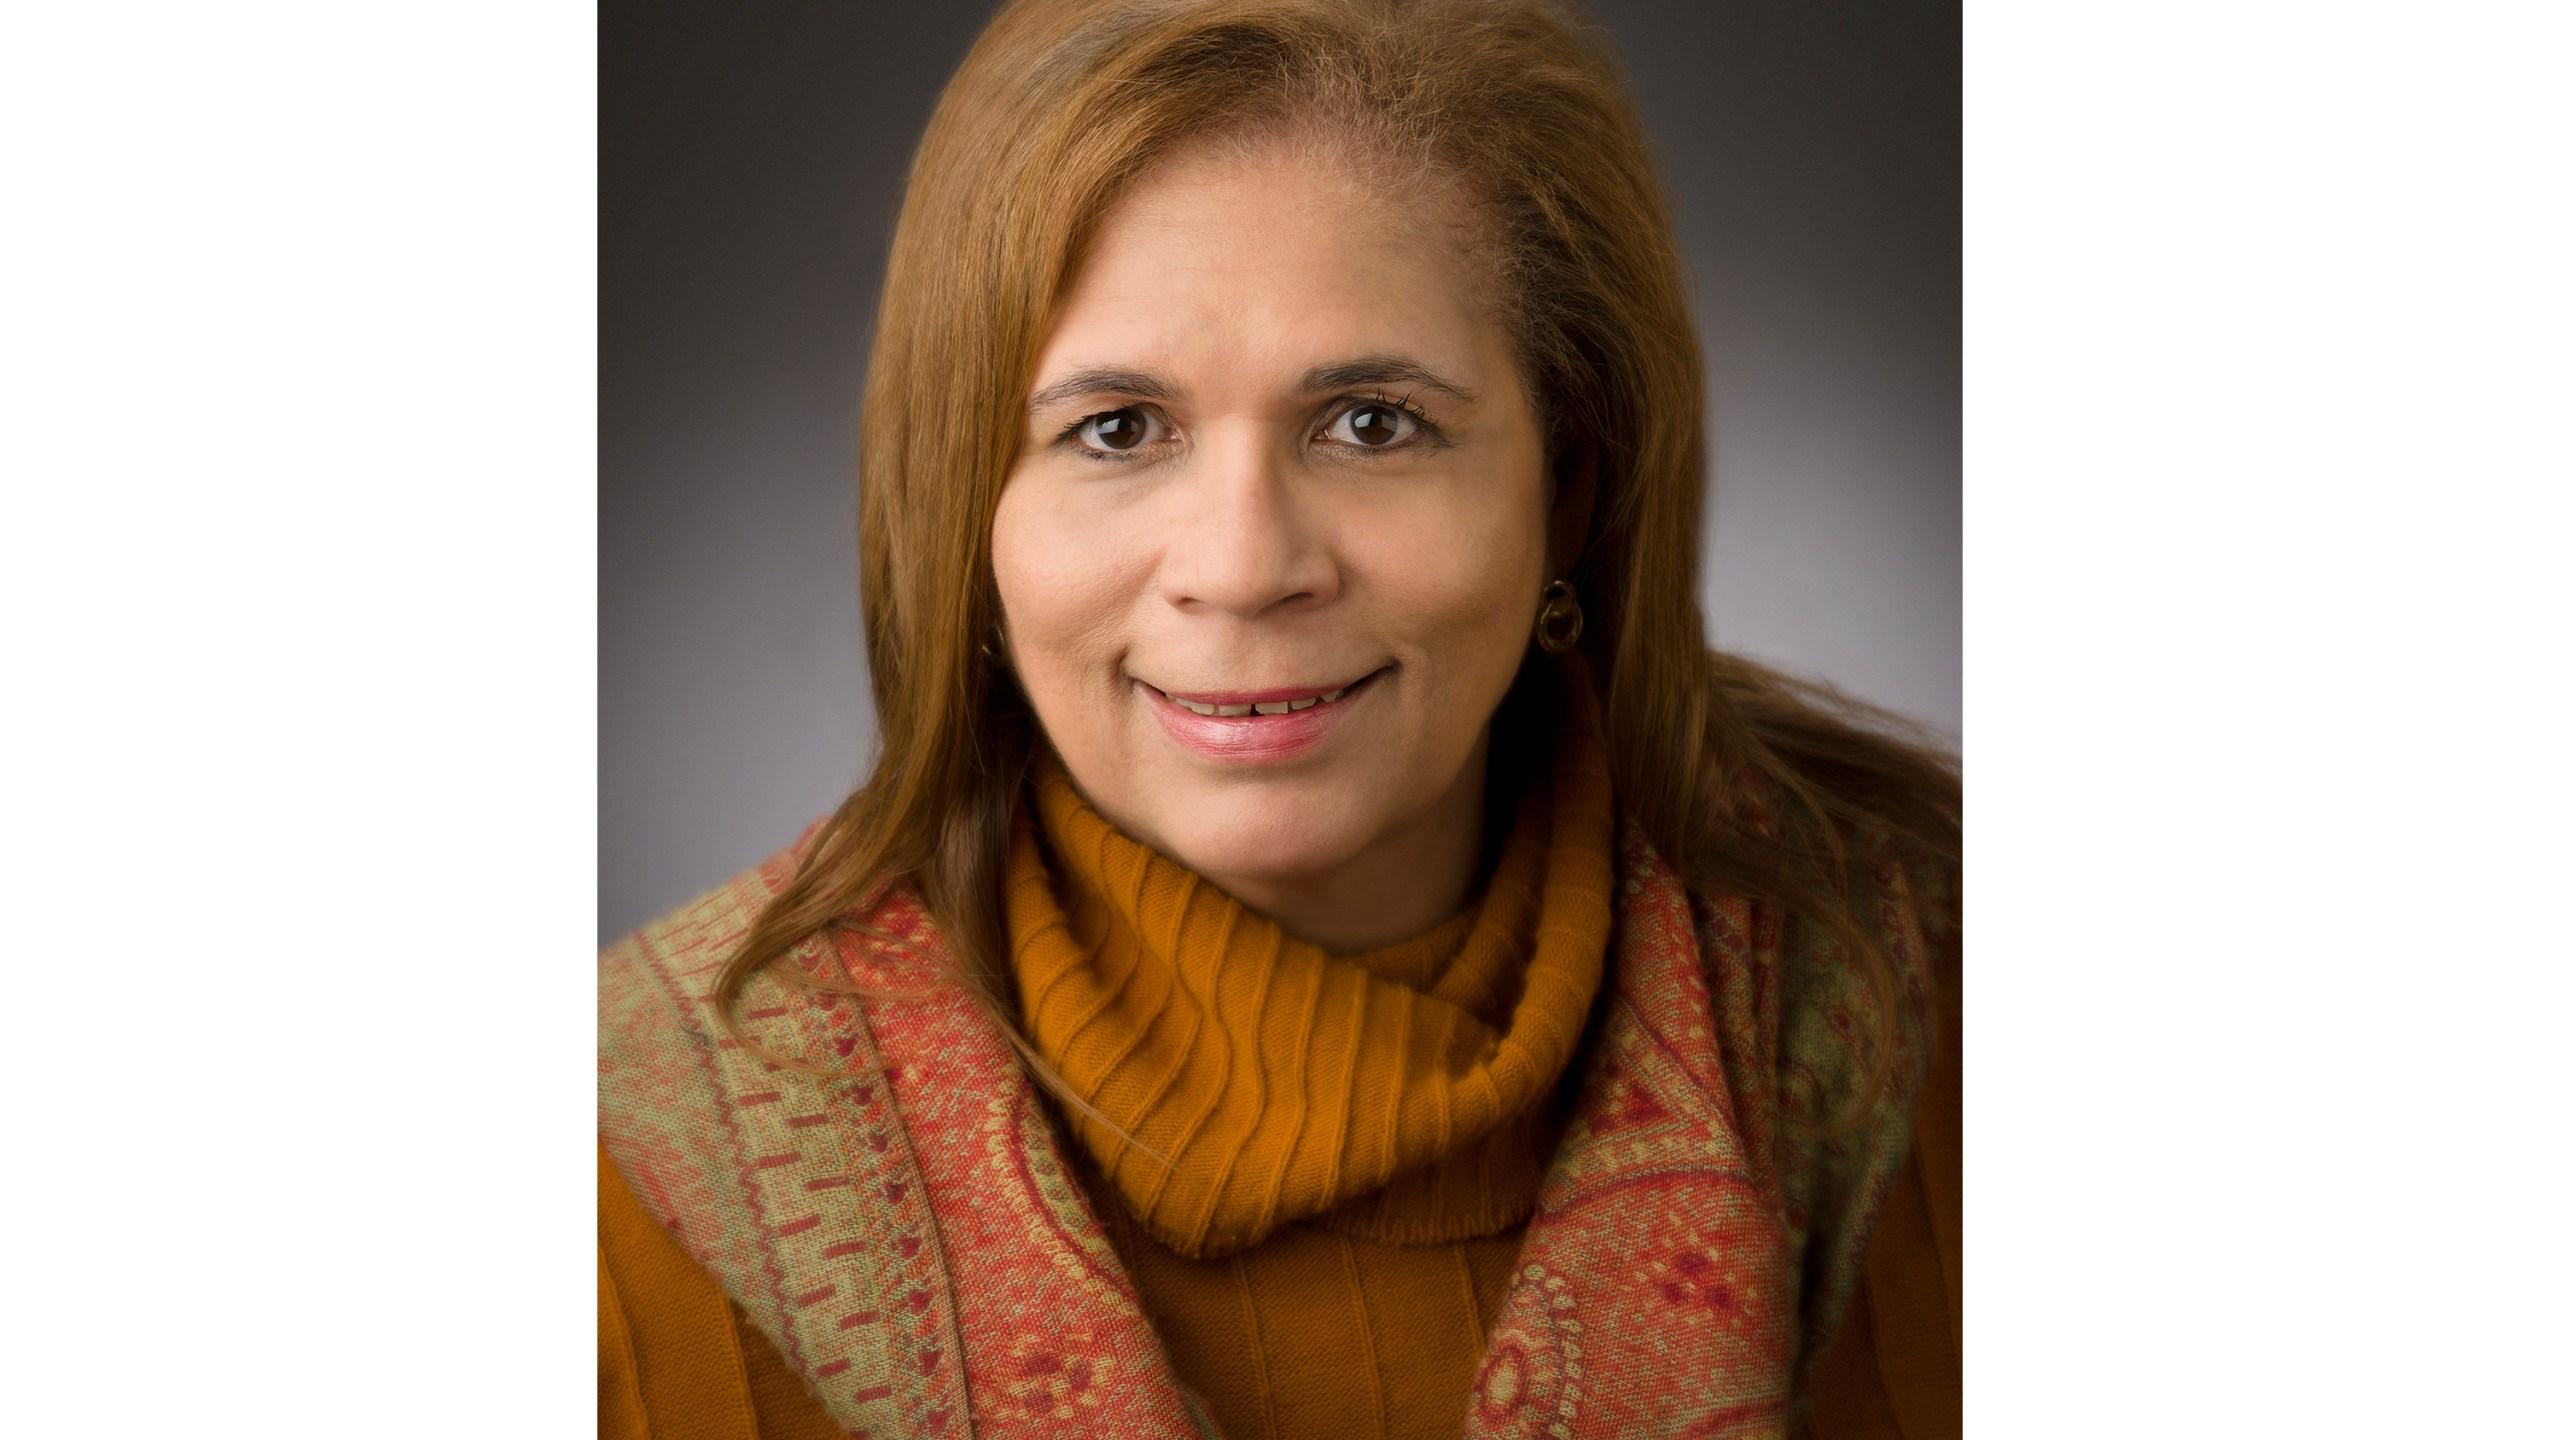 Phillipa  Ashford, Phillipa (Phil) Ashford, The Menninger Clinic, Houston, Texas, Phillipa Ashford